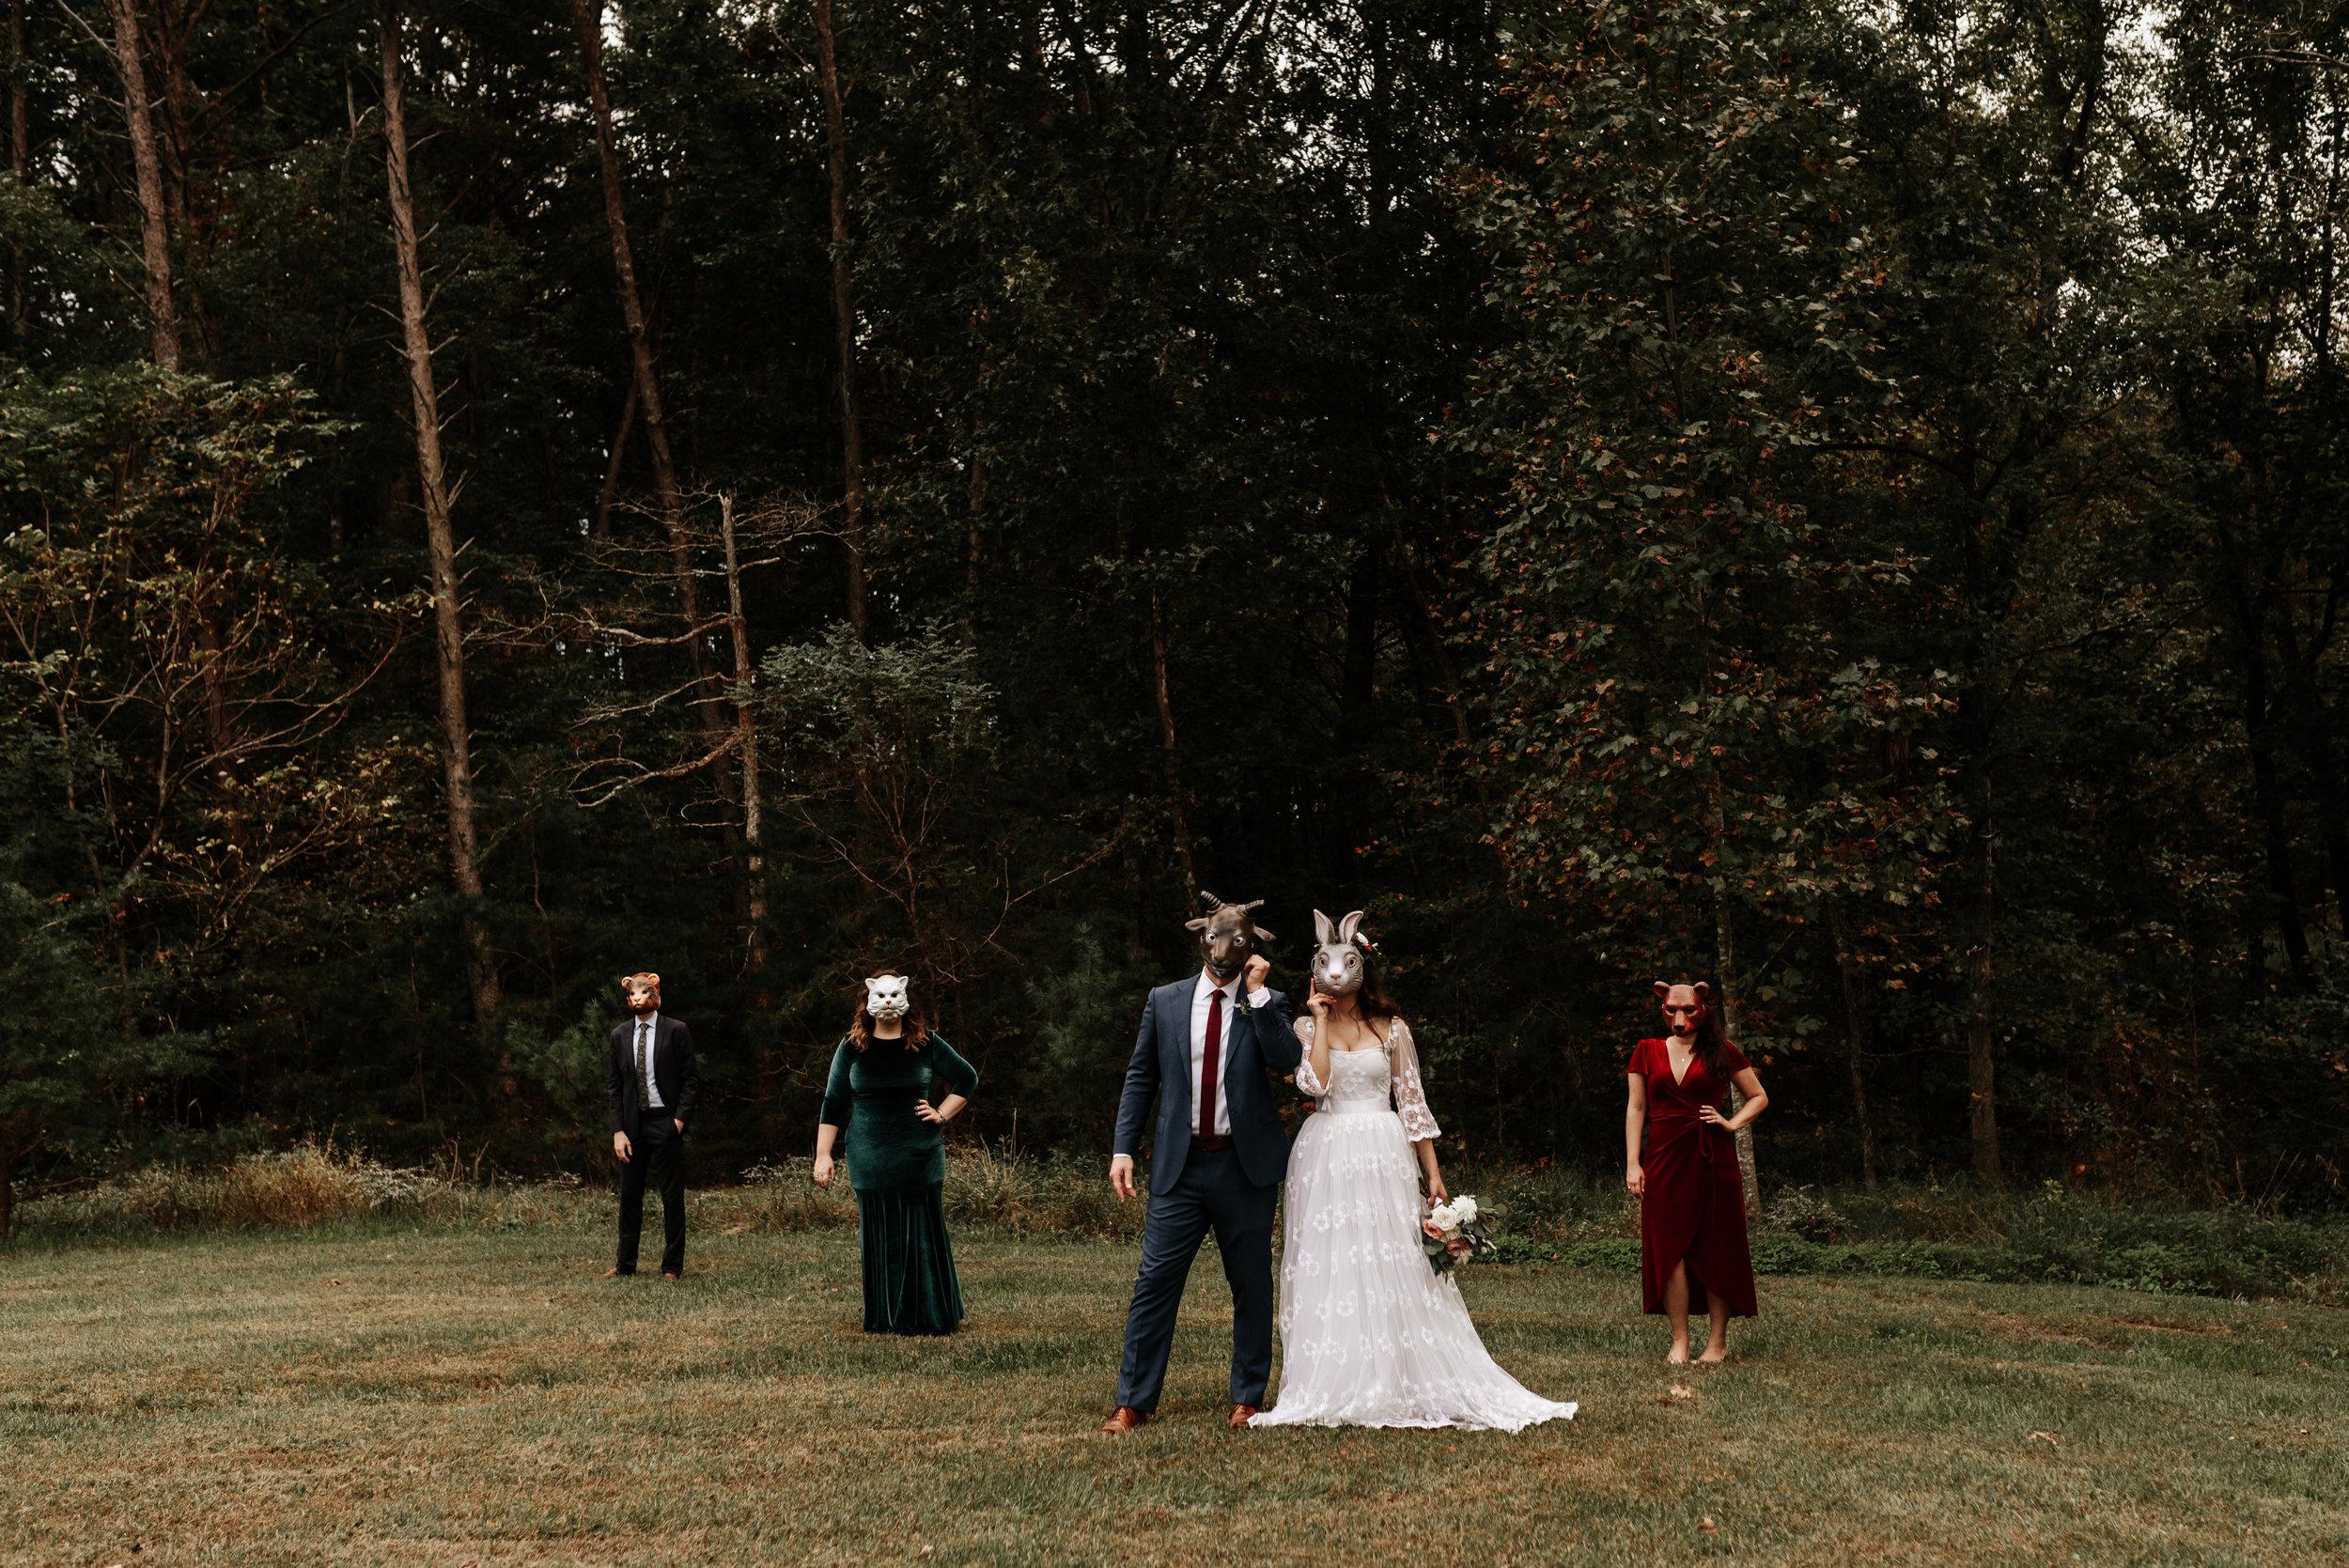 Veritas-Vineyards-and-Winery-Wedding-Photography-Afton-Virginia-Yasmin-Seth-Photography-by-V-9477.jpg